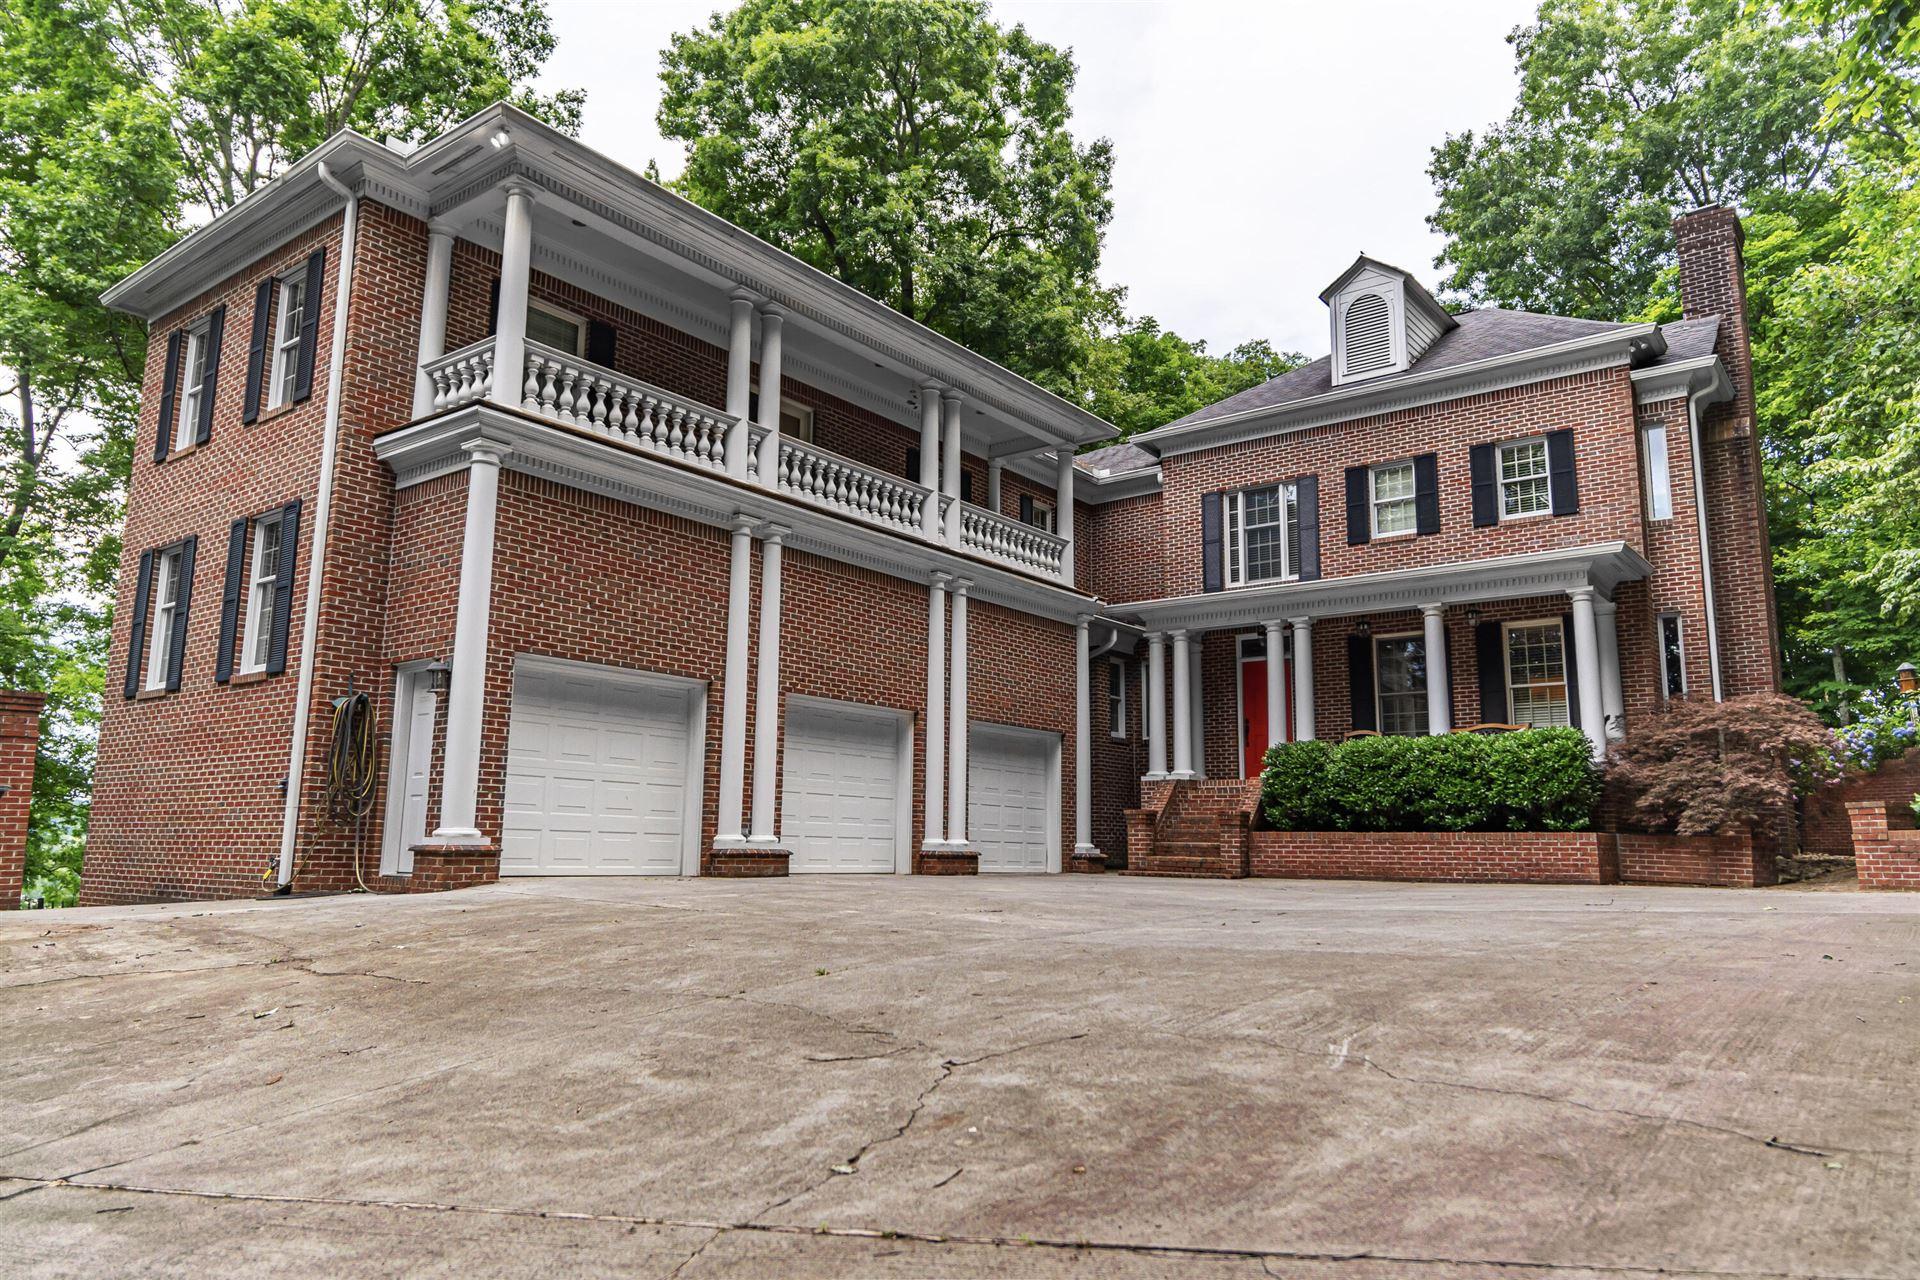 Photo of 15 Presidential Drive, Oak Ridge, TN 37830 (MLS # 1156328)